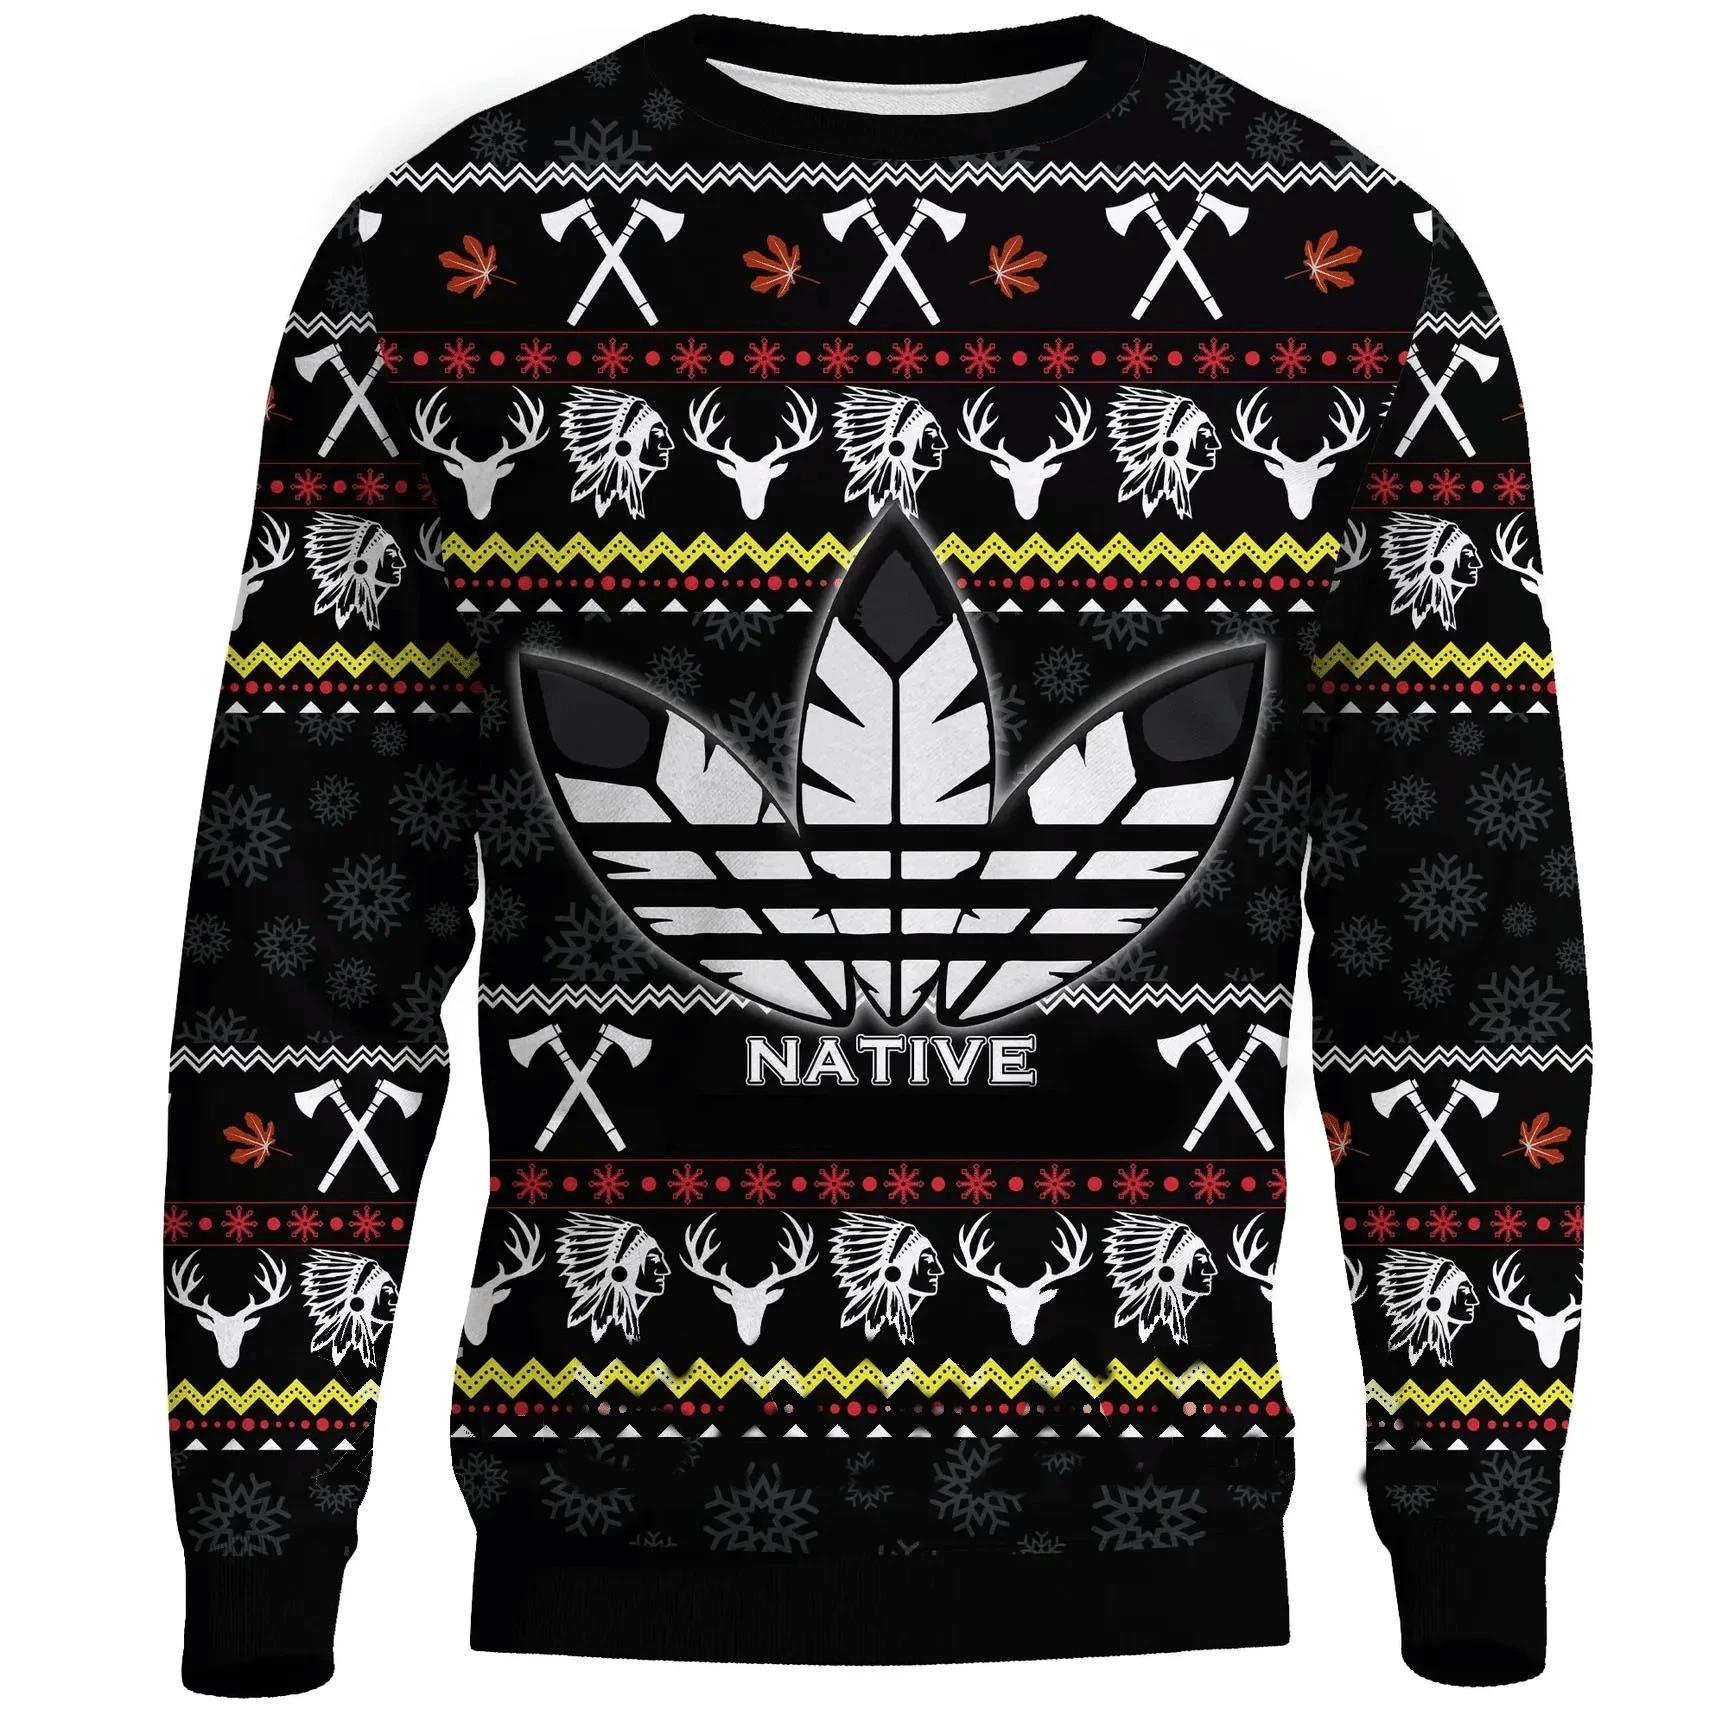 Native Sign 3D Christmas All Over Printed Shirt